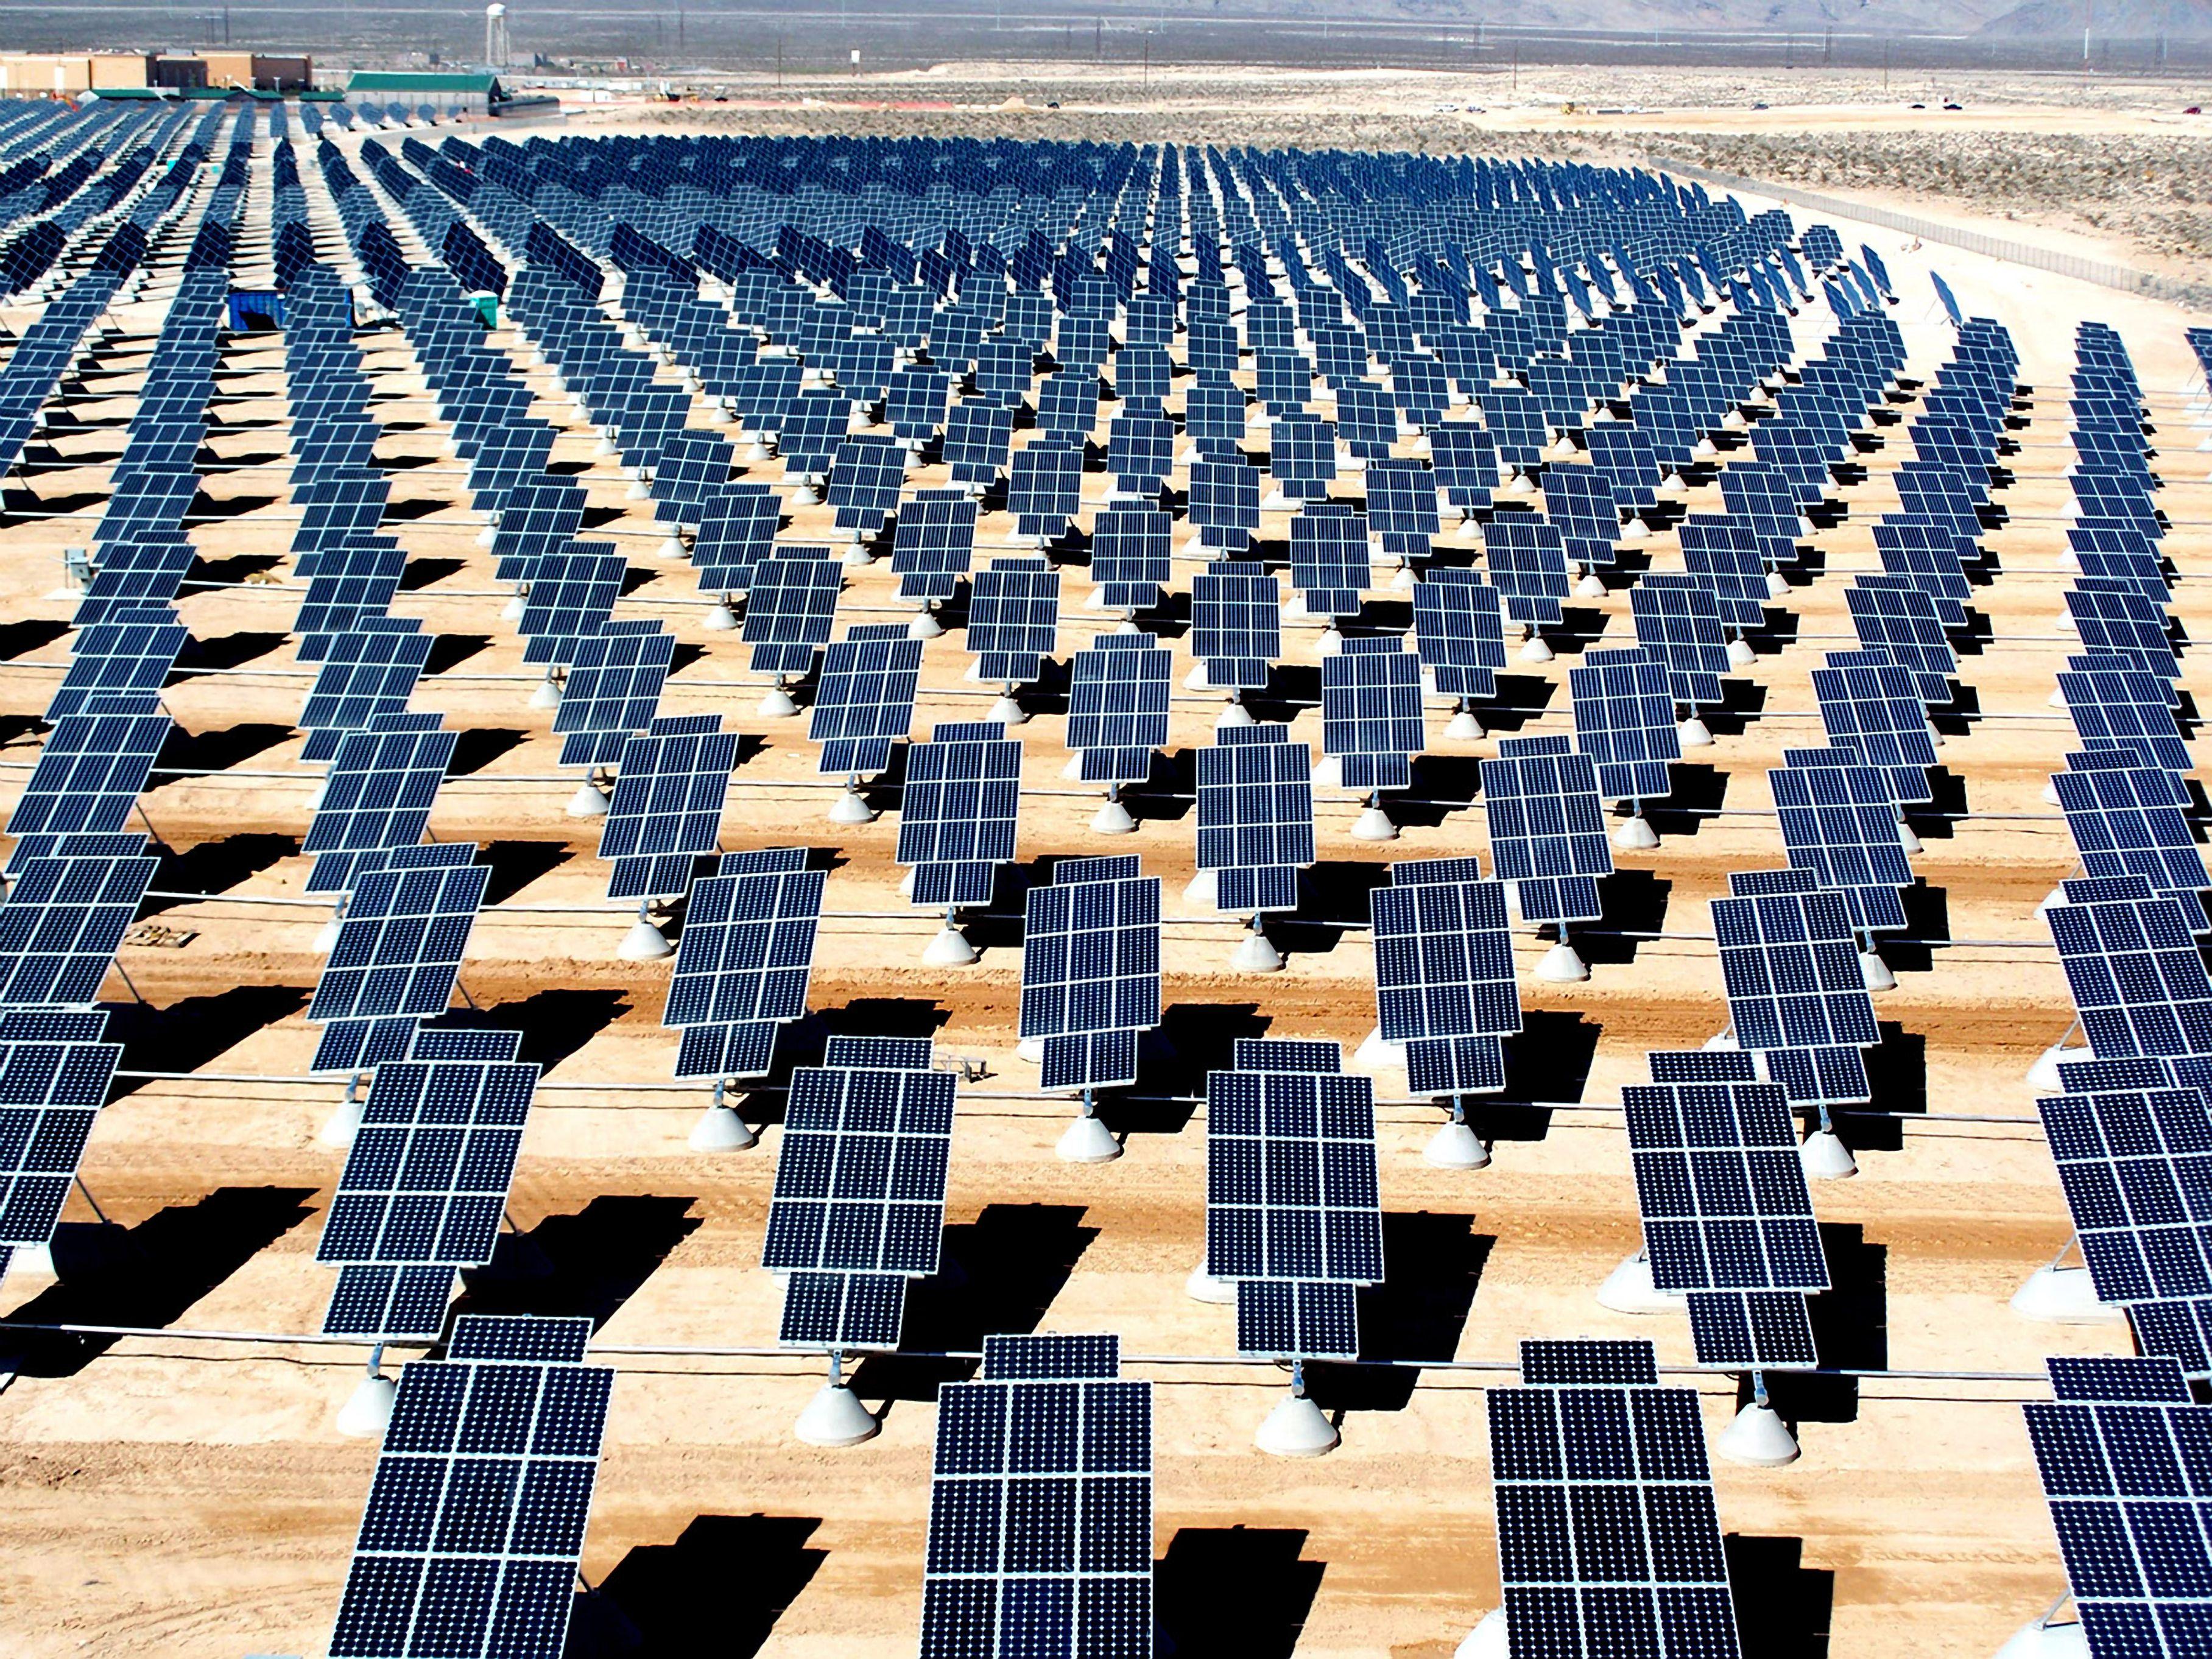 Top Renewable Energy Sources, Alternative Energy Today